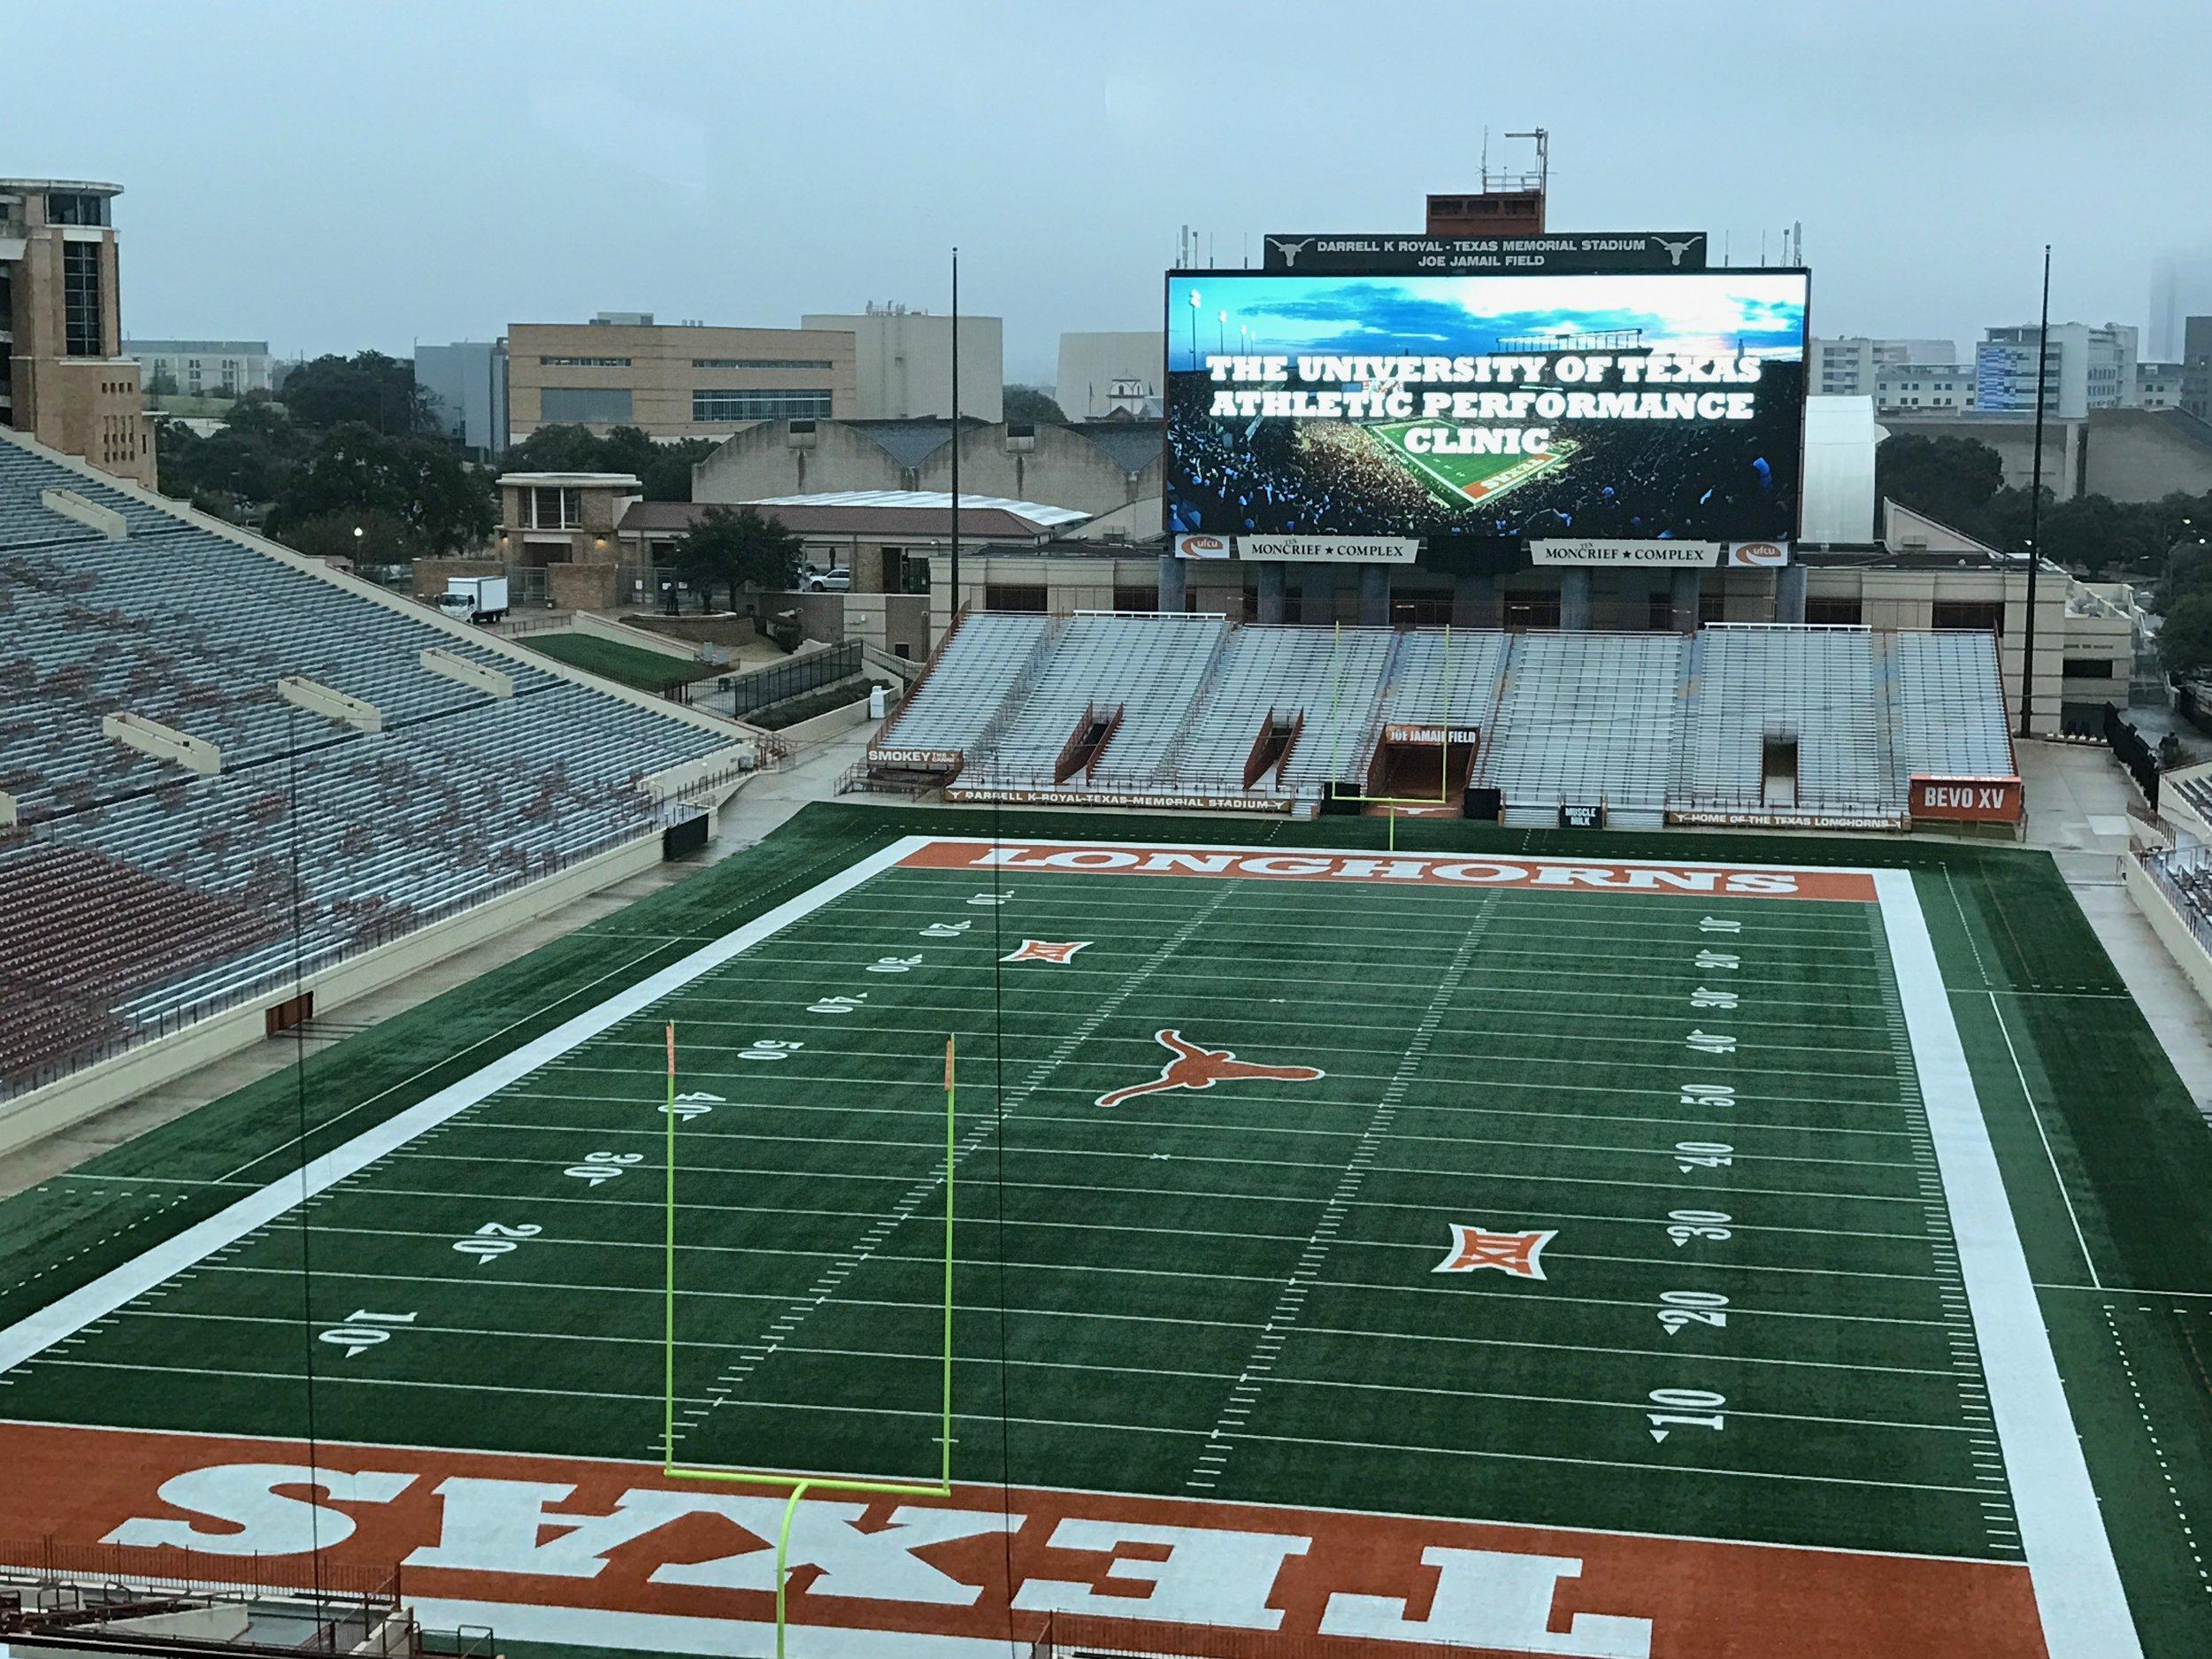 Darrell K. Royal Stadium at the University of Texas at Austin.